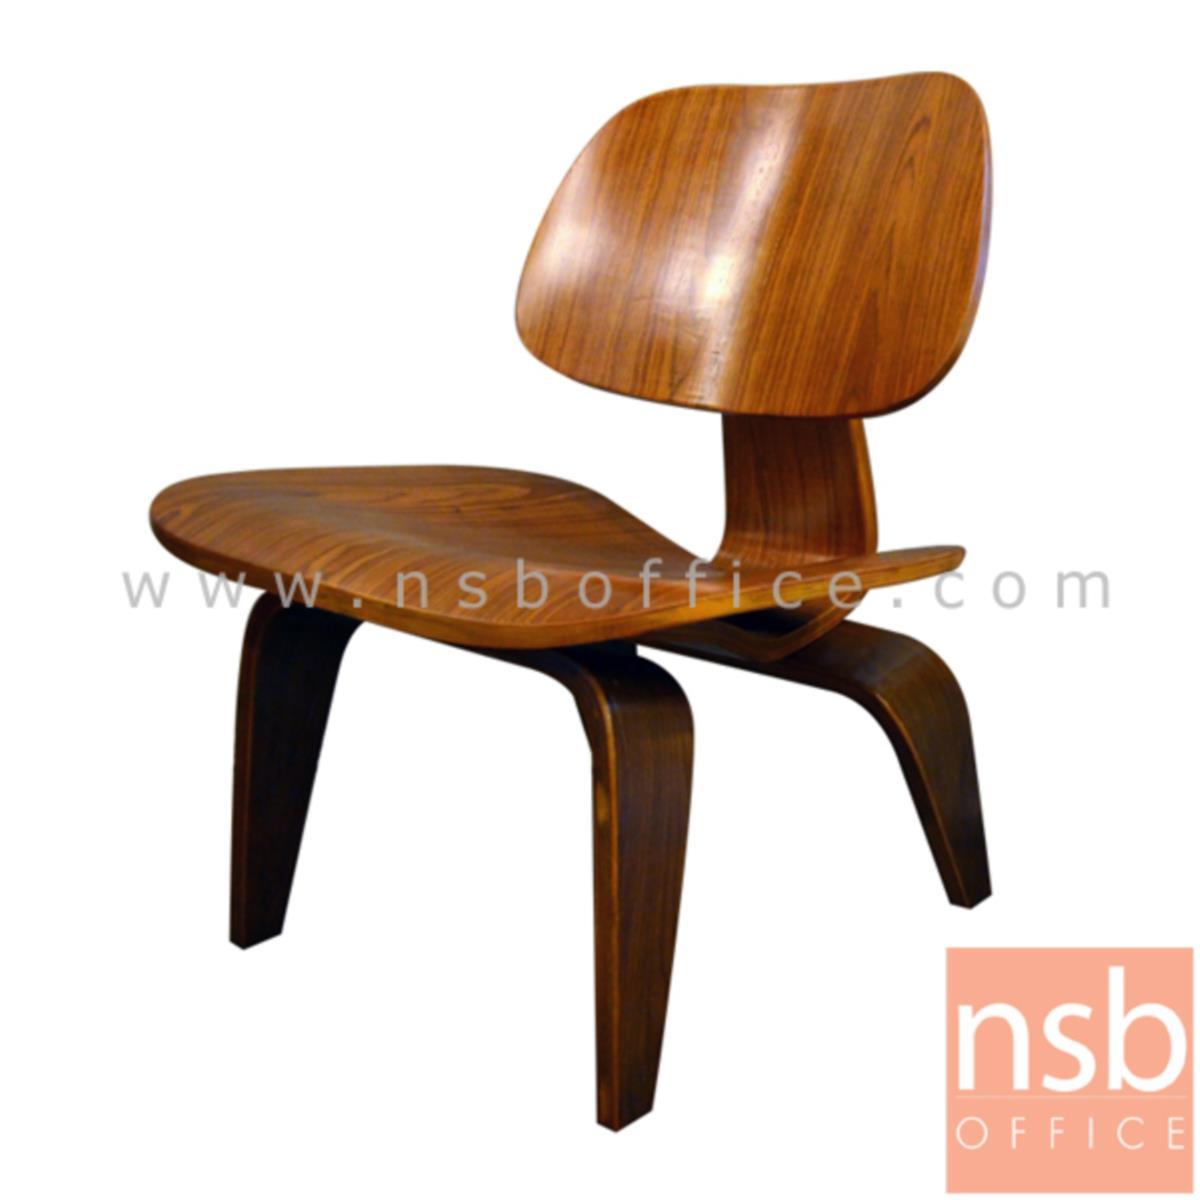 B29A165:เก้าอี้โมเดิร์นไม้ รุ่น PN-92661 ขนาด 56W cm. โครงขาไม้